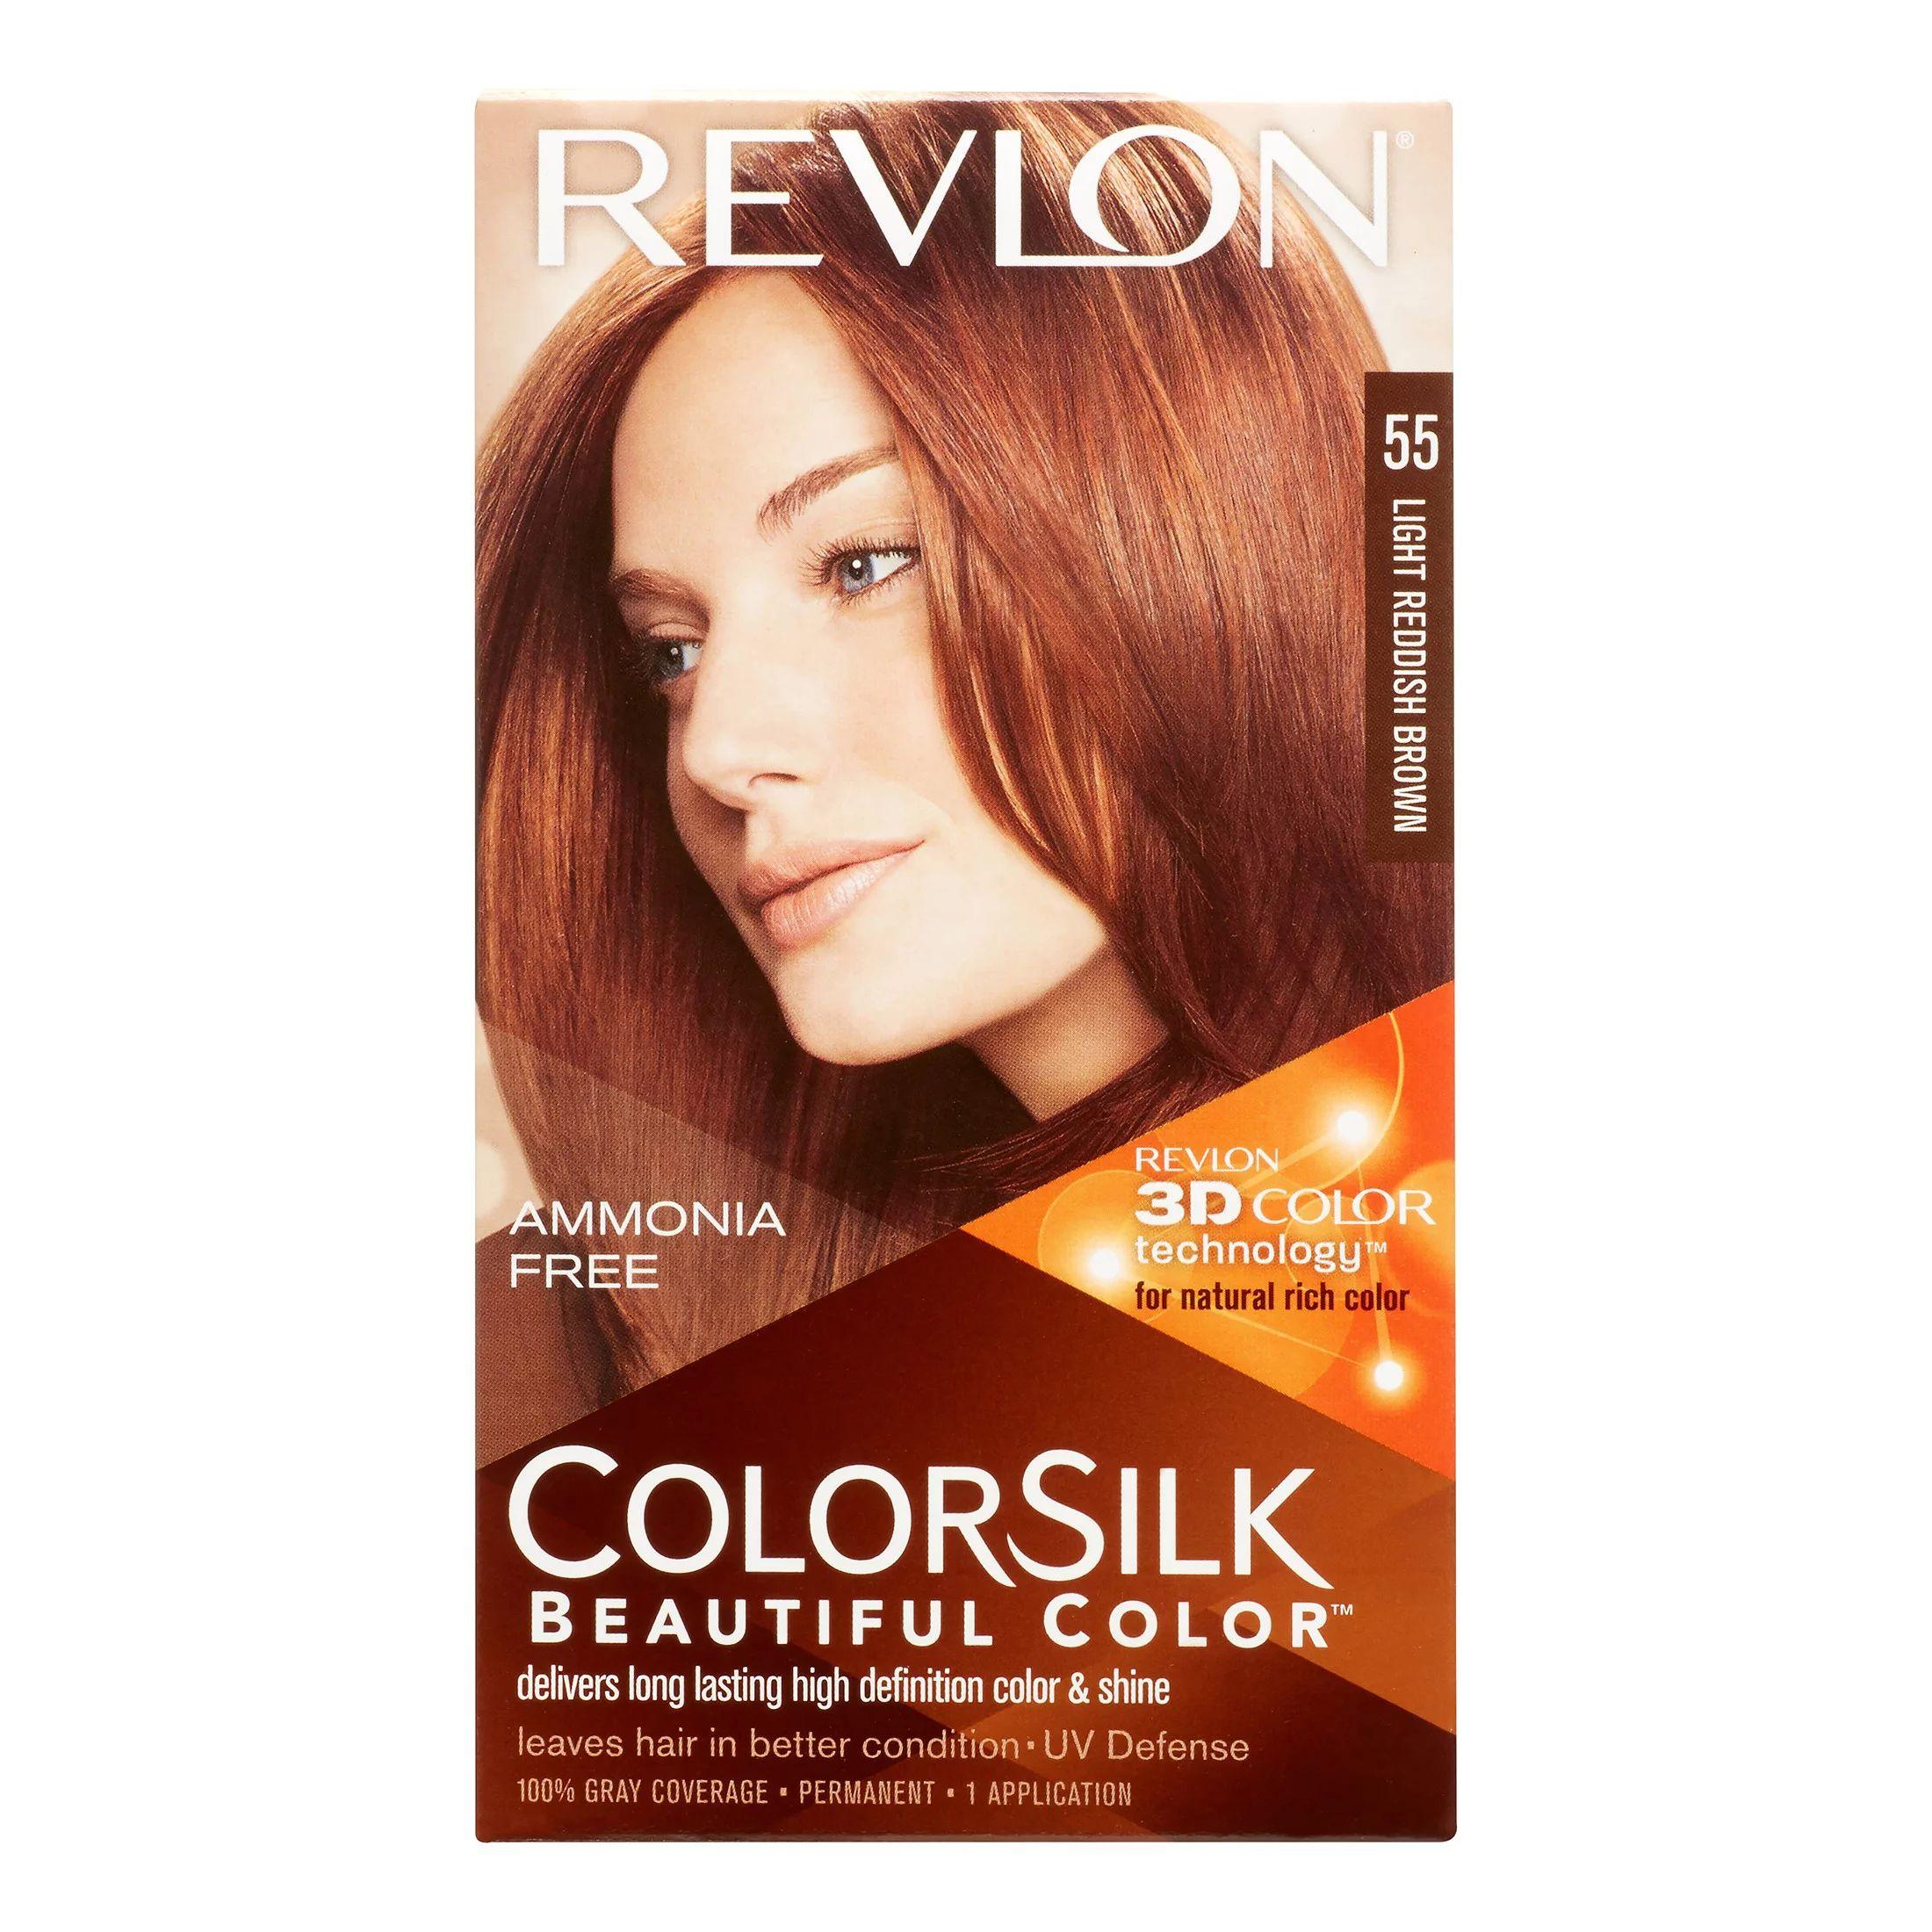 Revlon colorsilk beautiful color permanent hair color 55 light reddish brown walmart com